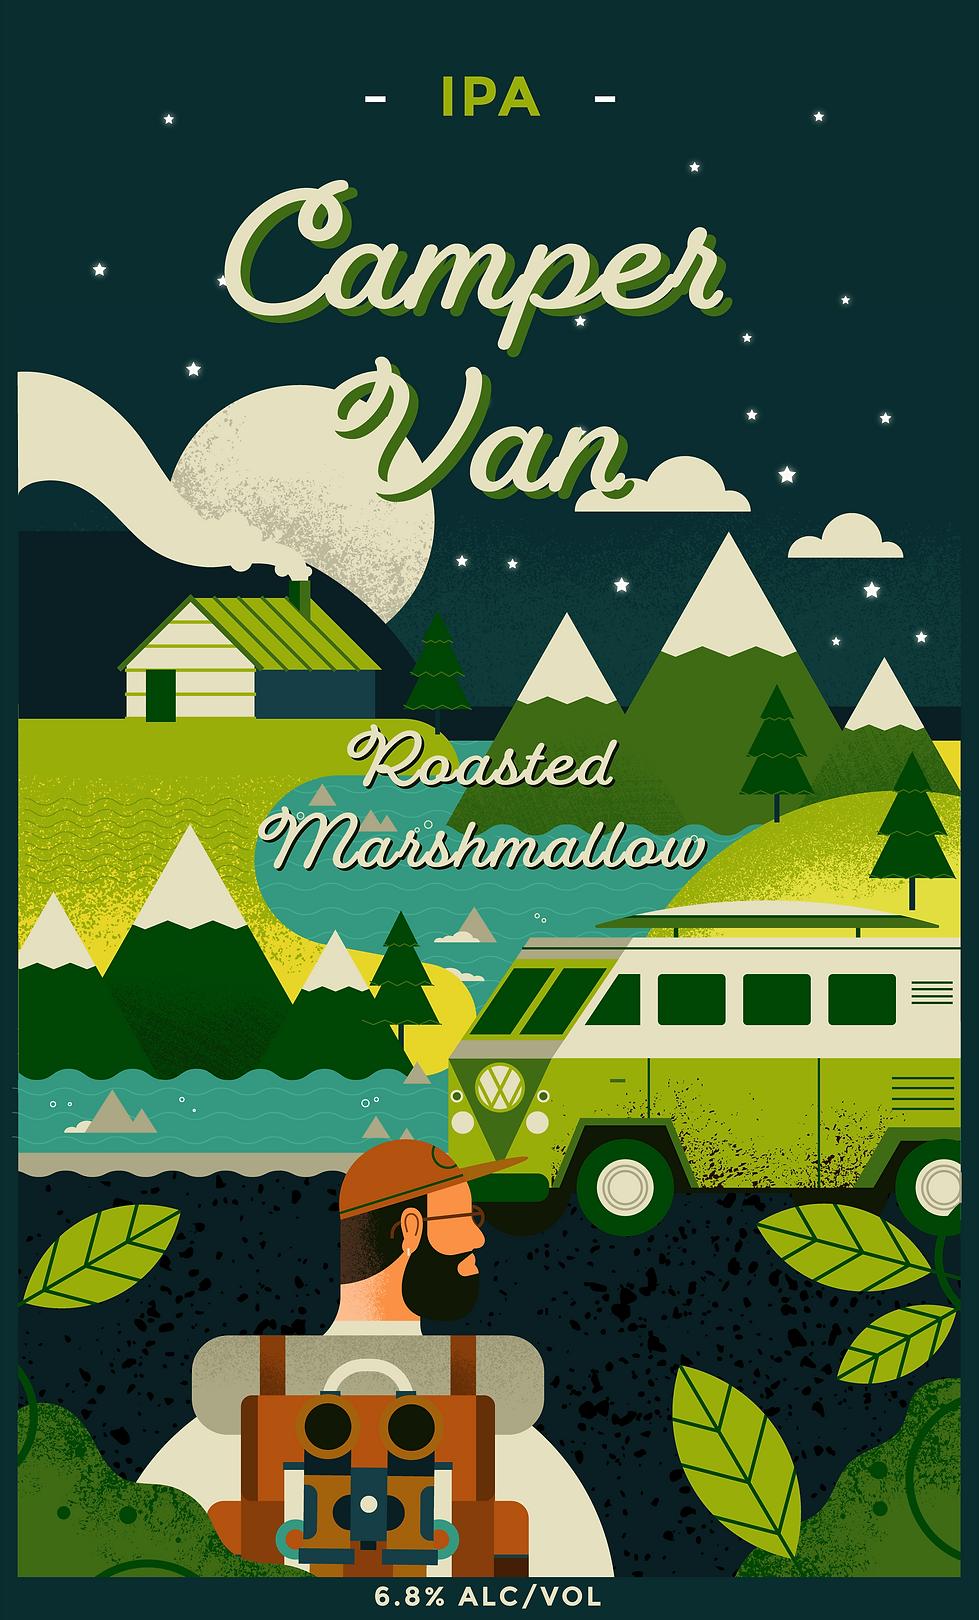 Campervan Craft Beer Label New.png